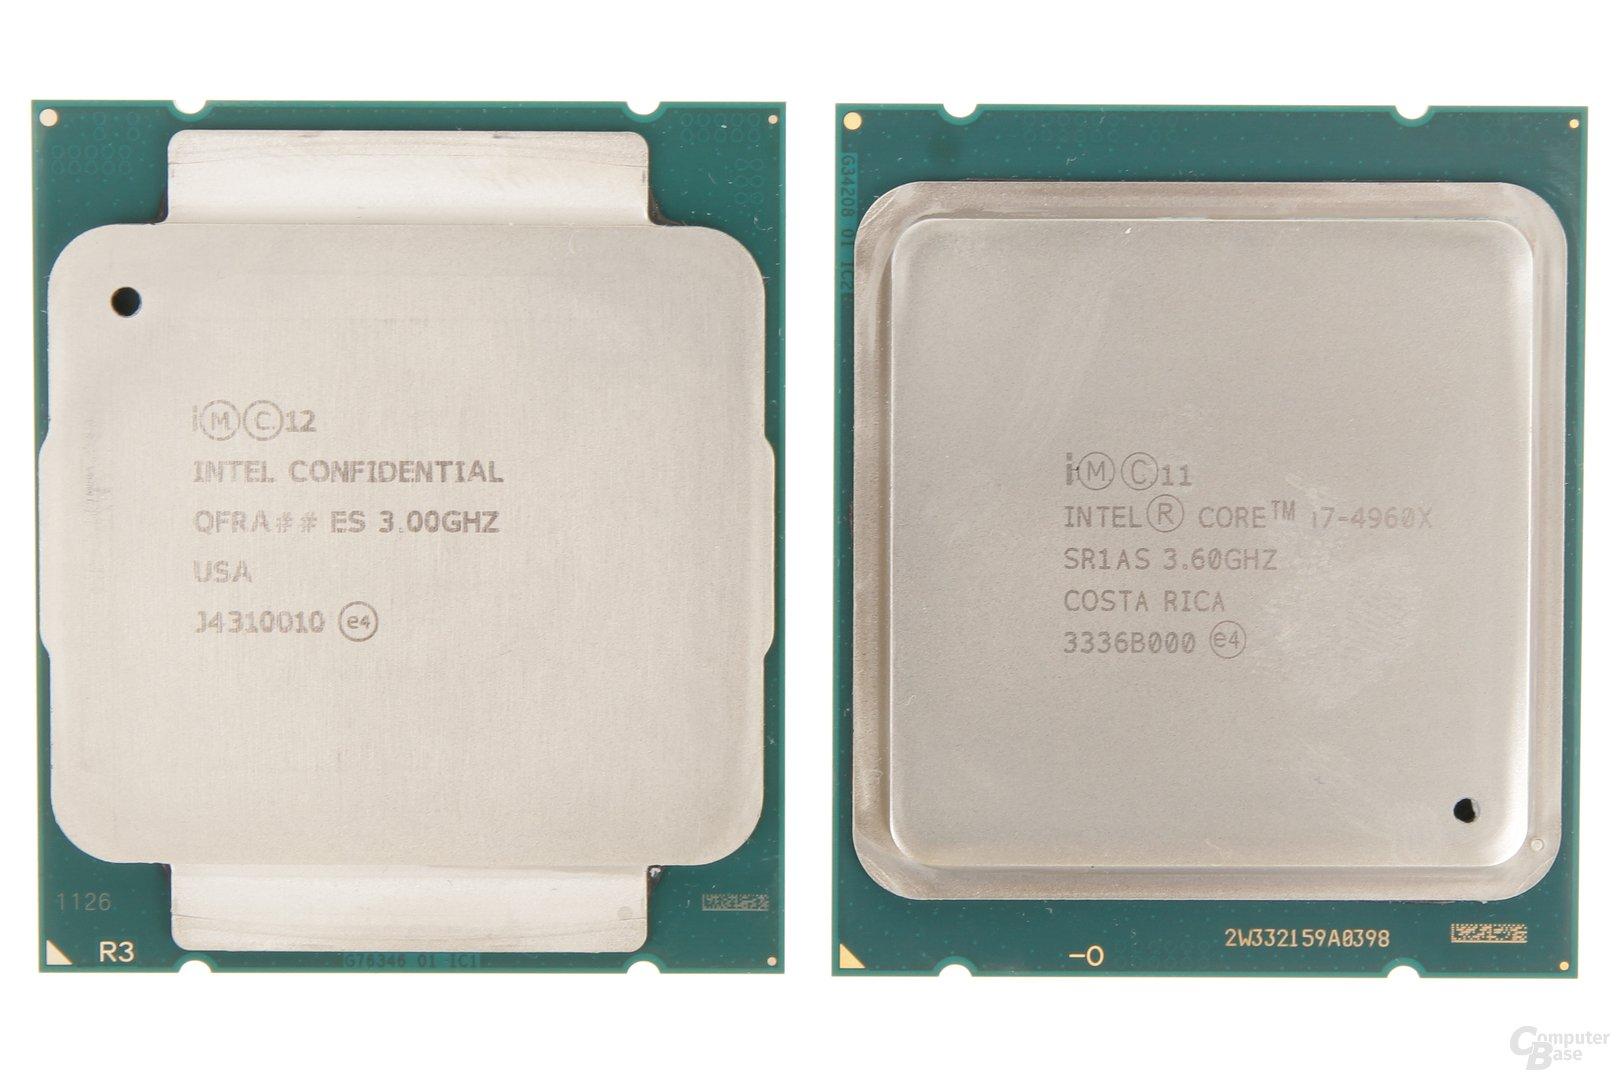 Intel Core i7-5690X (Haswell-E) gegen Core i7-4690X (Ivy Bridge-E)